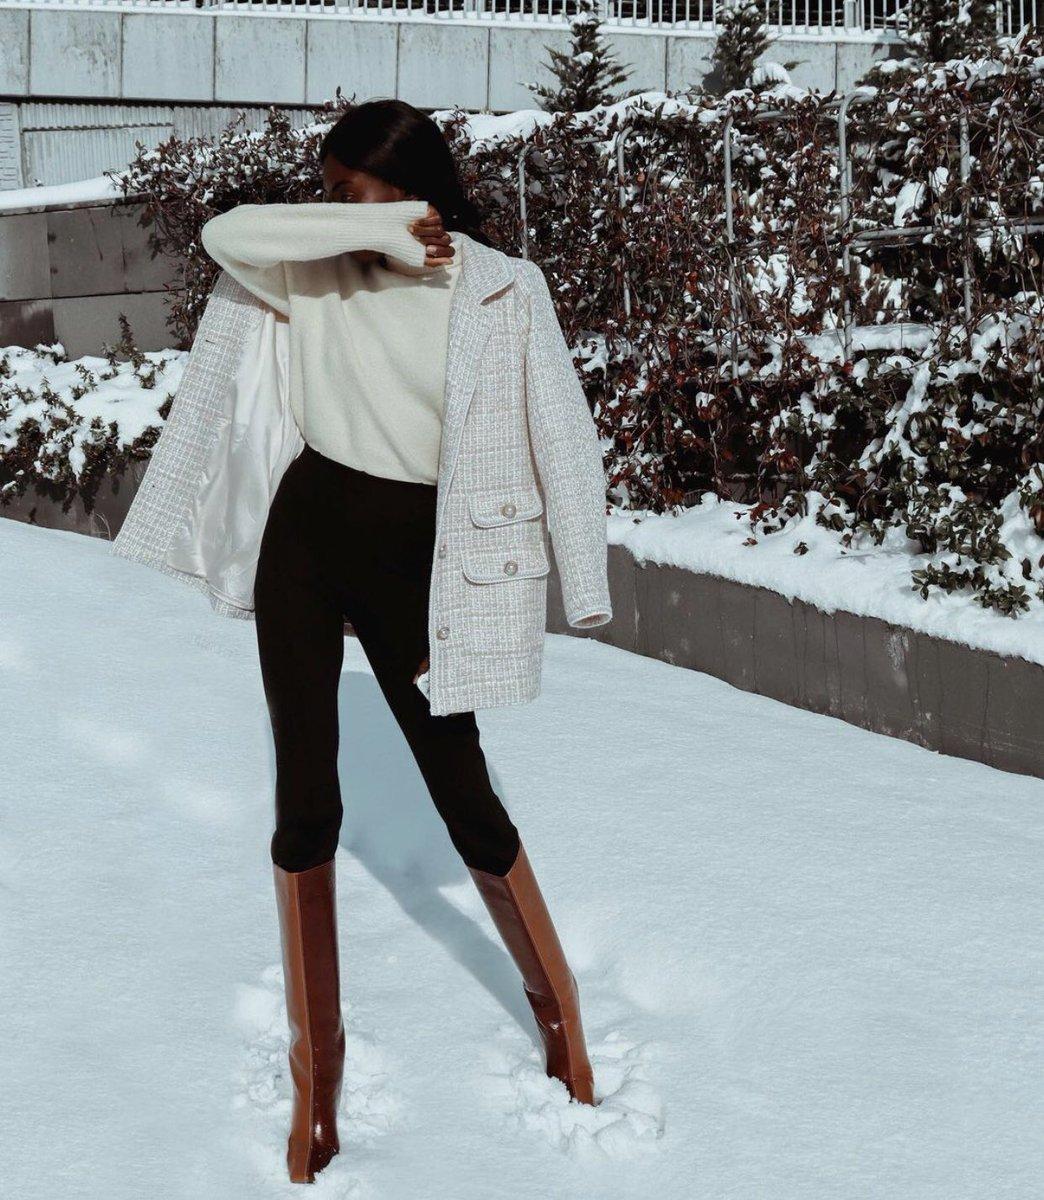 Beautiful!   Photo credit: @life_withisabel  .  #elegantly_a_lady #readytowear #madetomeasure #hautecouture #elegance #classy #fallwinterfashion #Qatar #Tweet  #stylishoutfit #luxuryfashion #fashion #beauty #fashiondesign #style #luxury #workwear #classywomen #Dubai #Turkey